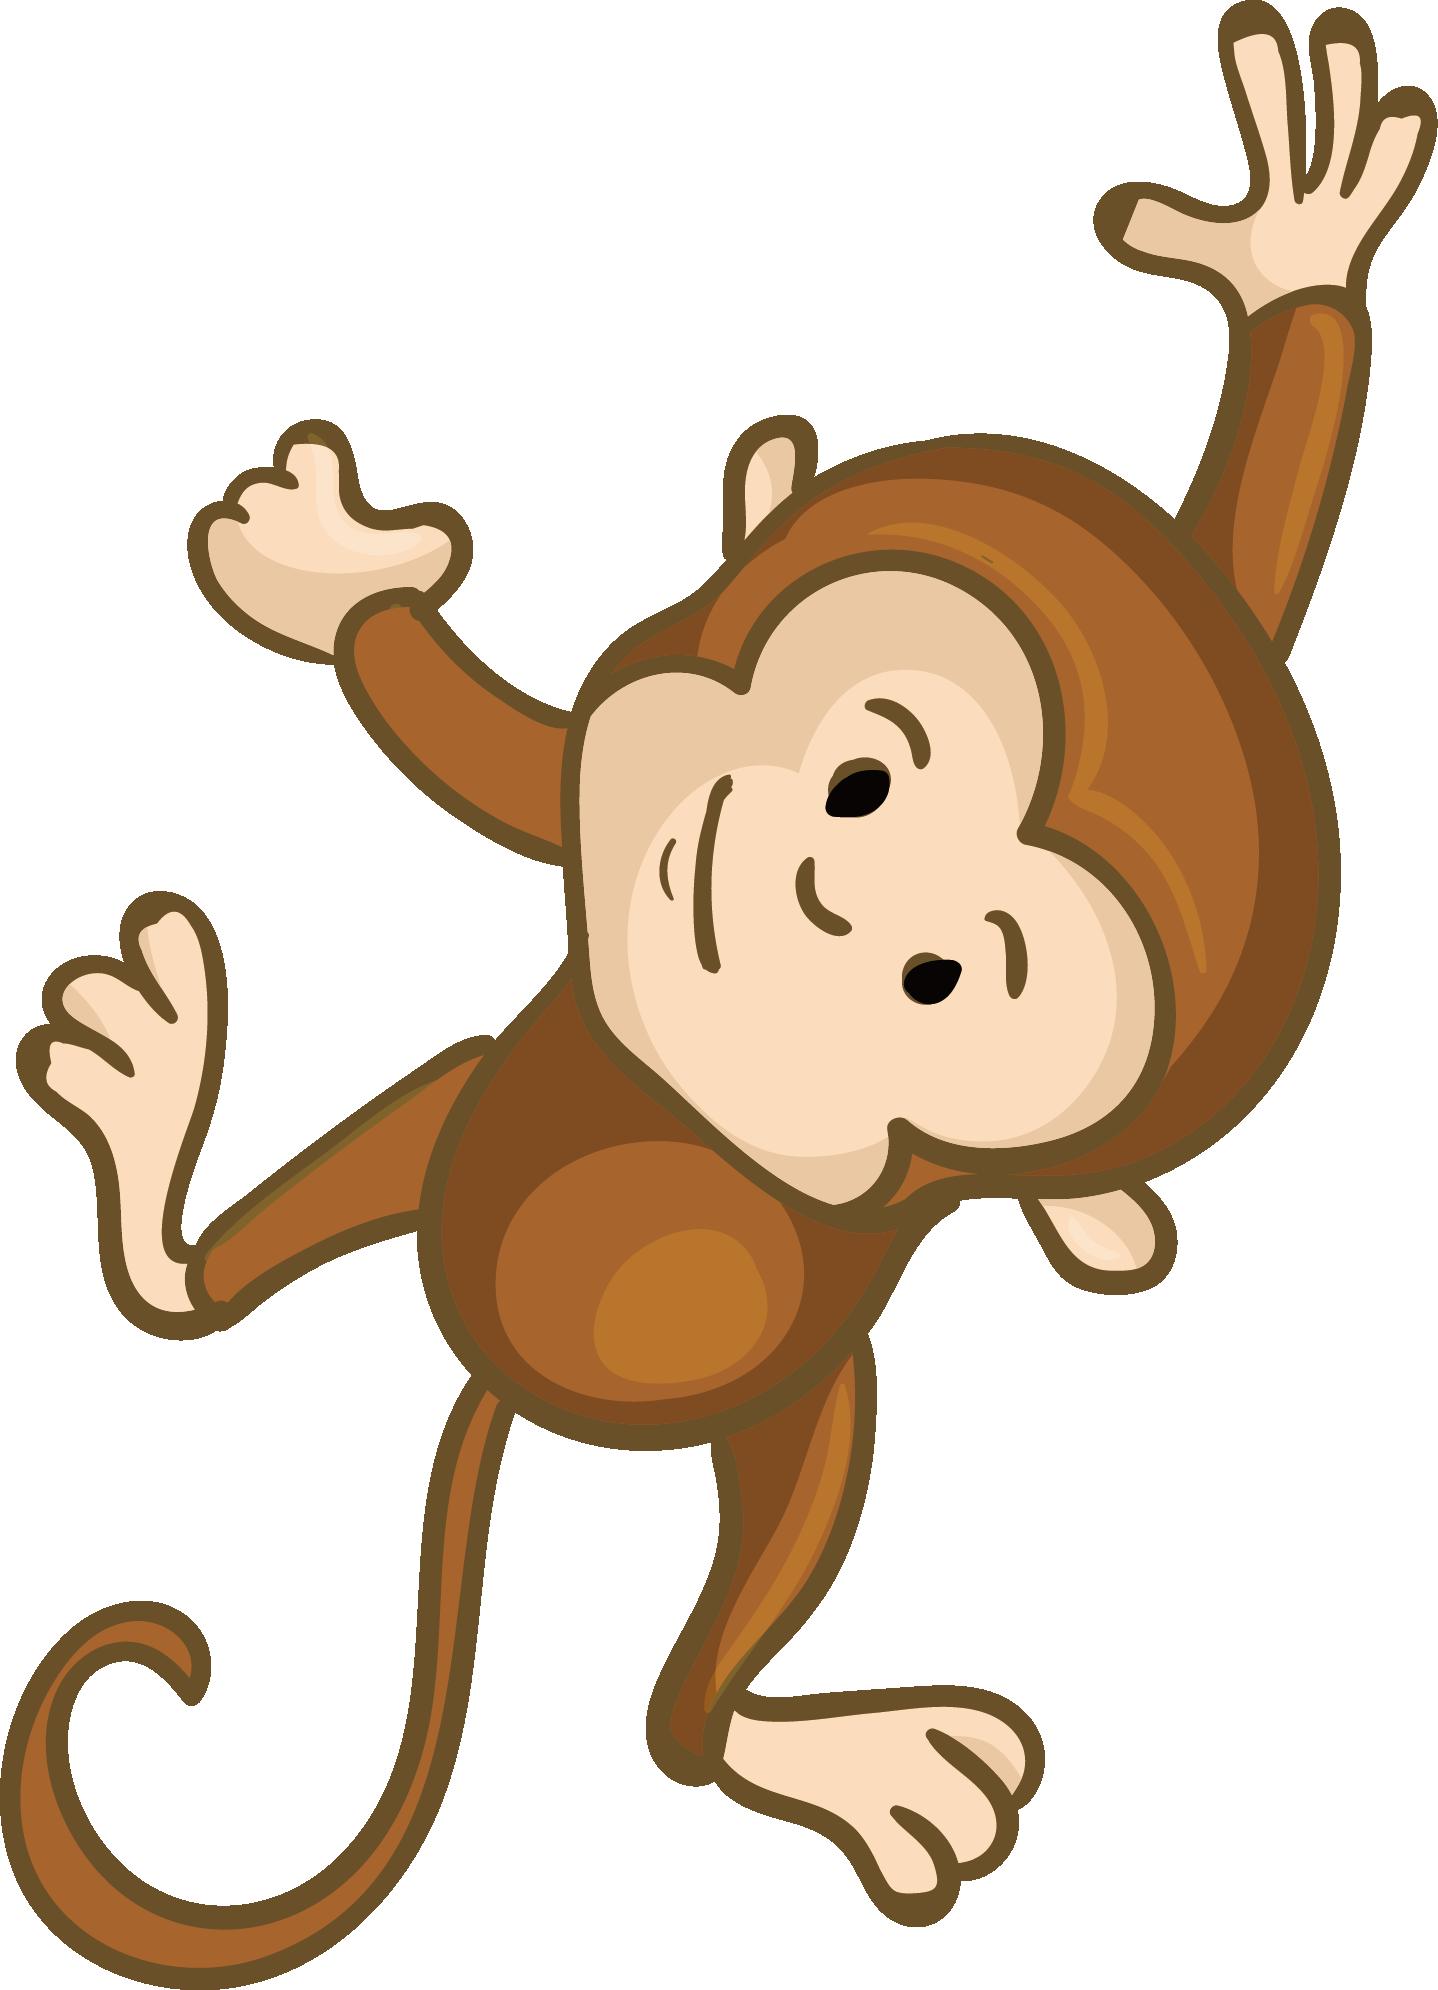 Download Monkey Clip Art Cute Monkey Cartoon Png Png Image